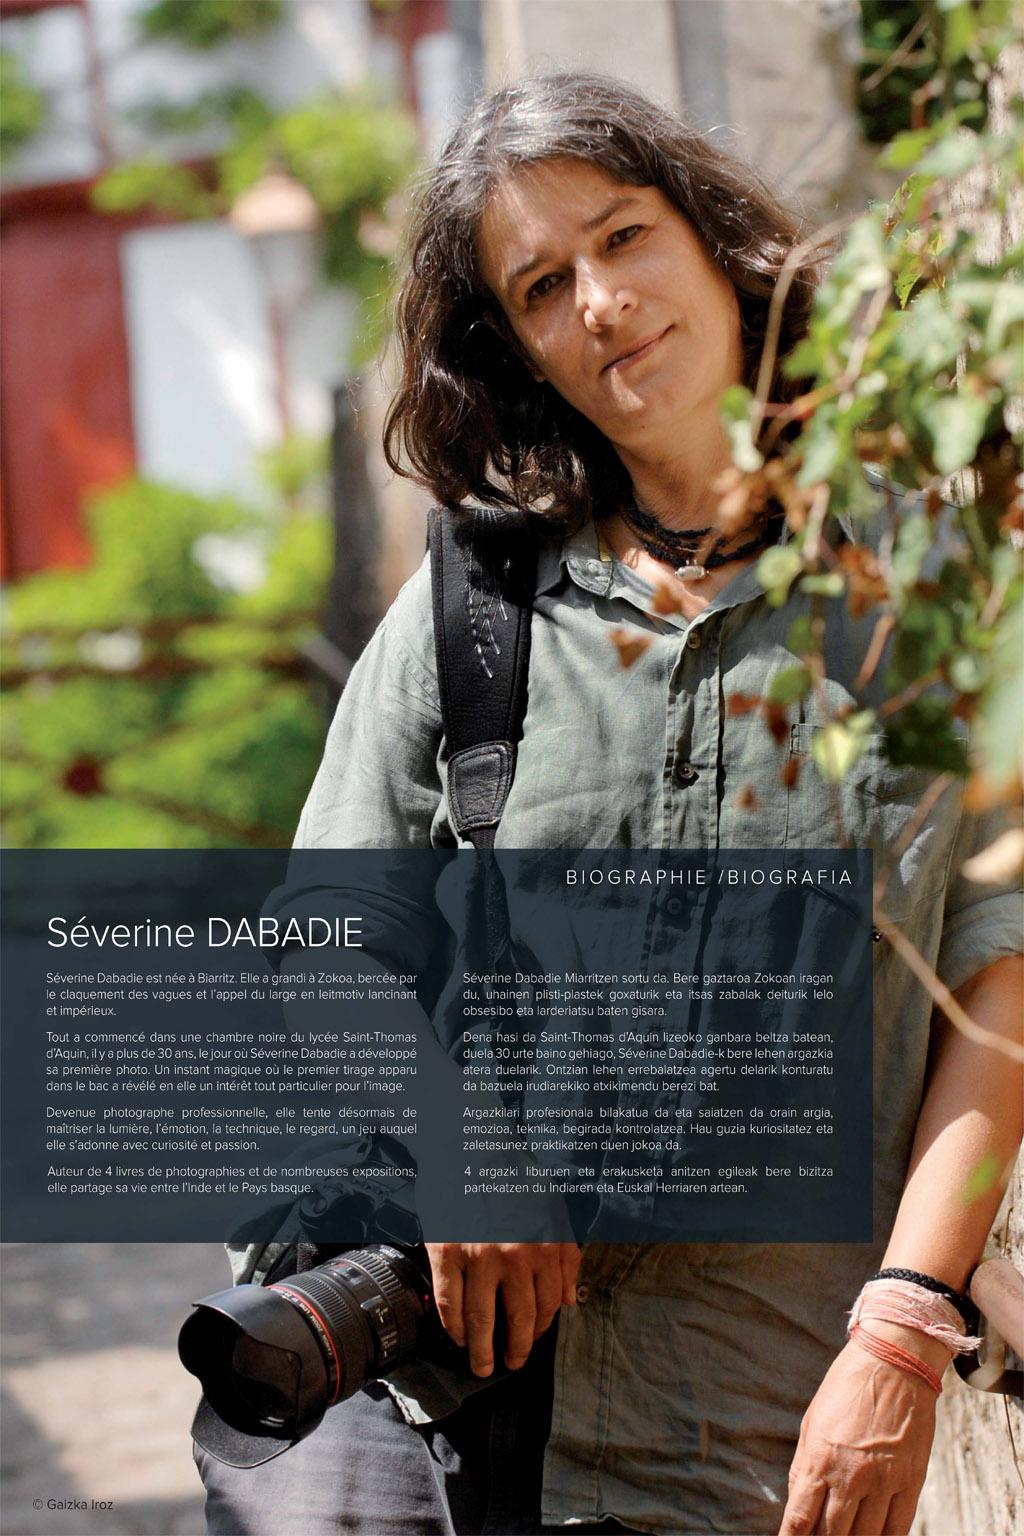 u00a9 gaizka iroz magazine du pays basque consacr u00c9  u00c0 s u00c9verine dabadie